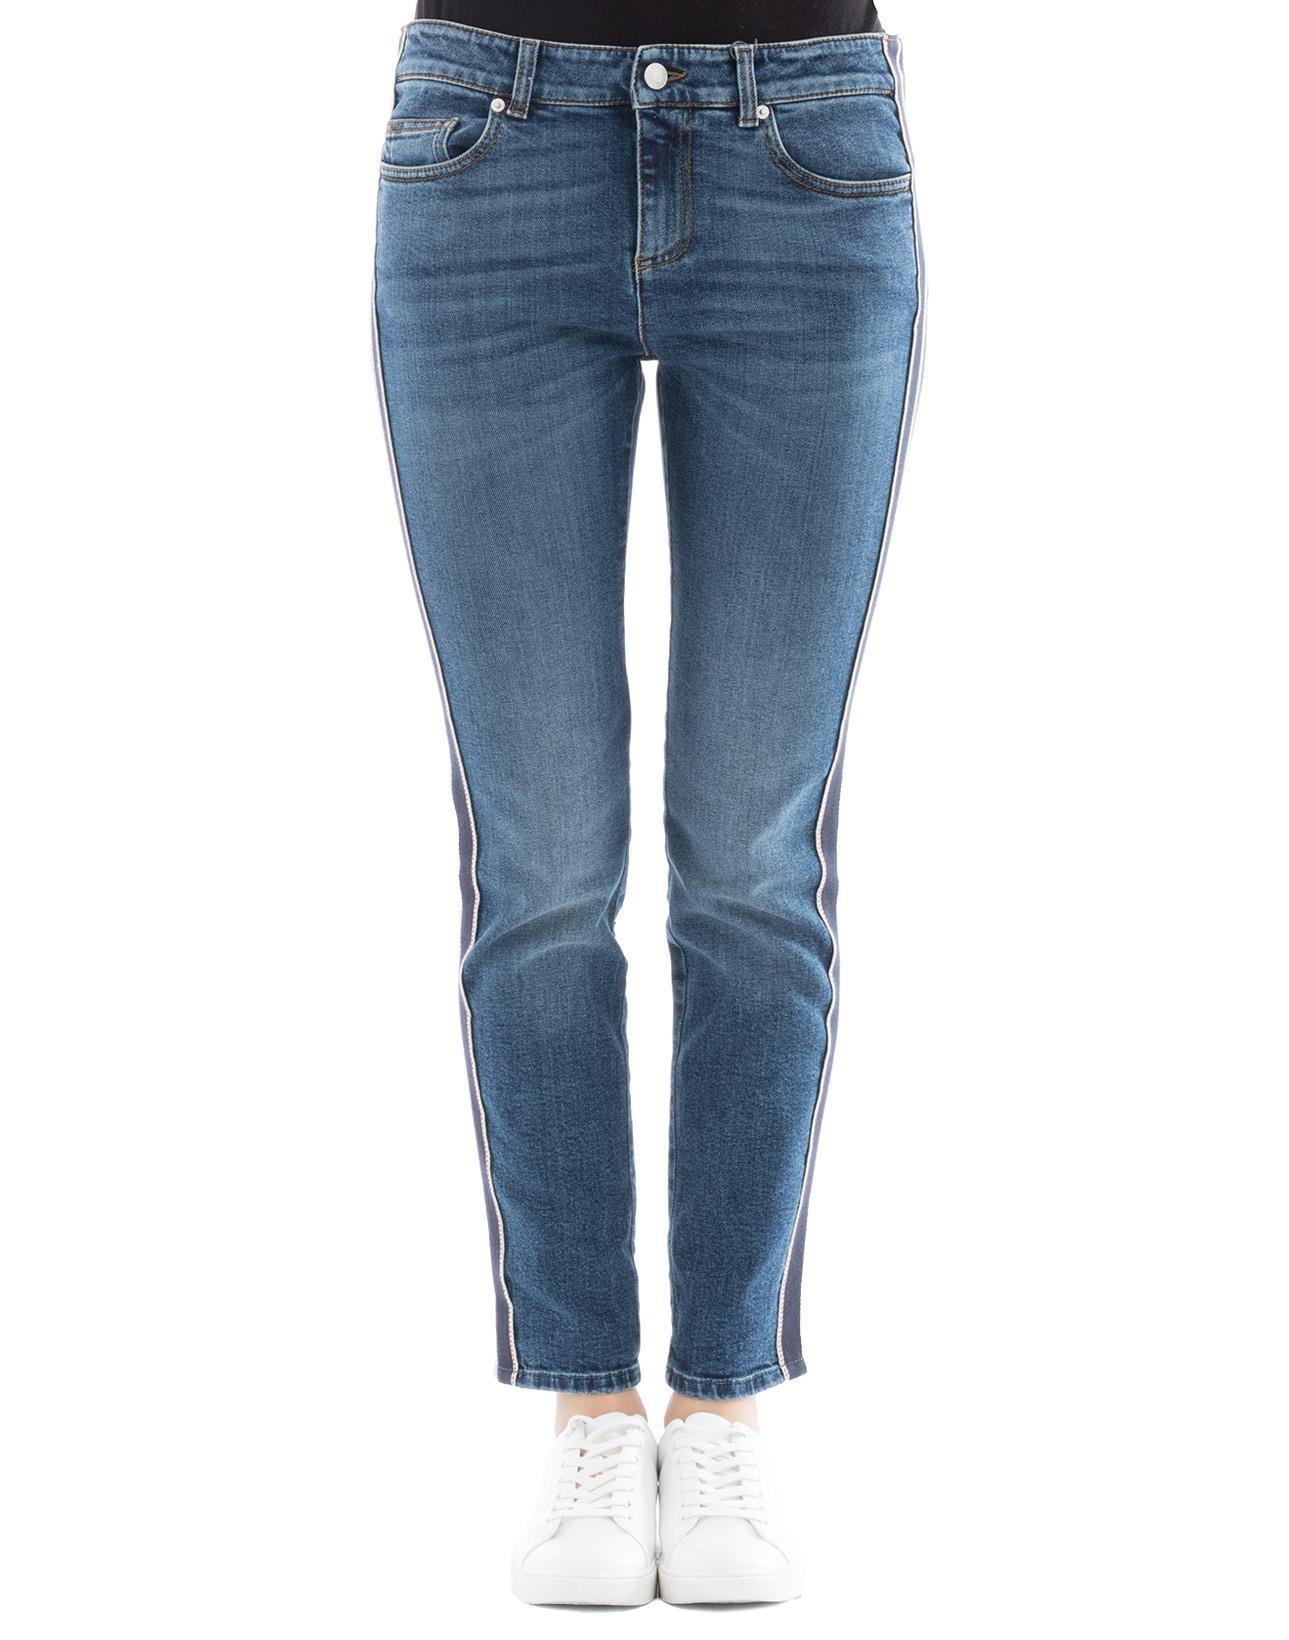 Alexander McQueen Women's 501957Qkm034340 Blue Cotton Jeans